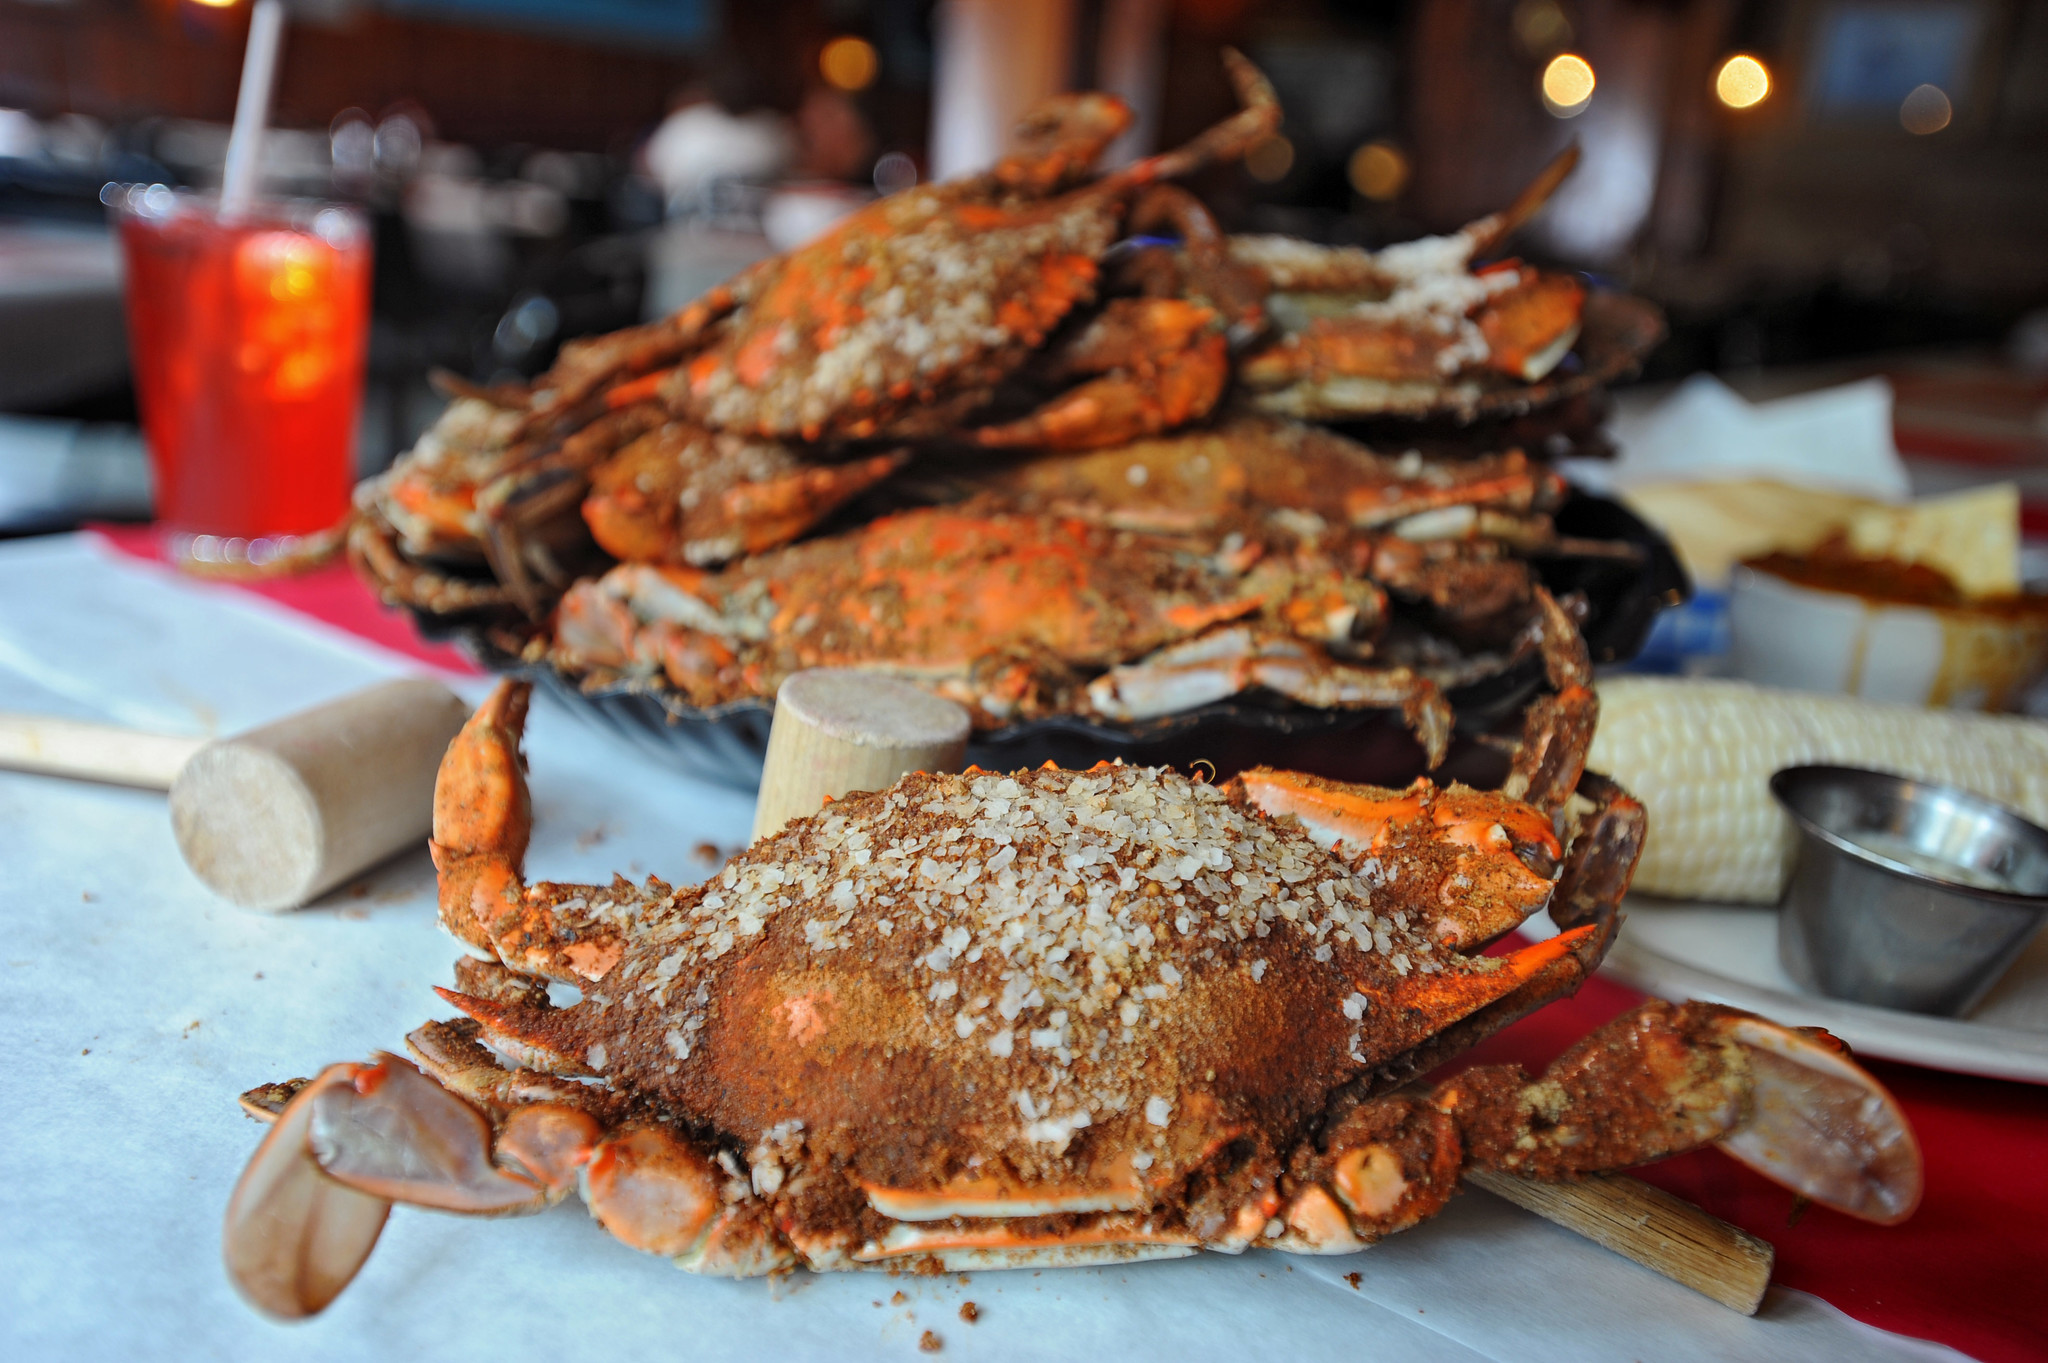 Schultzs Crab House in Es receives James Beard Americas